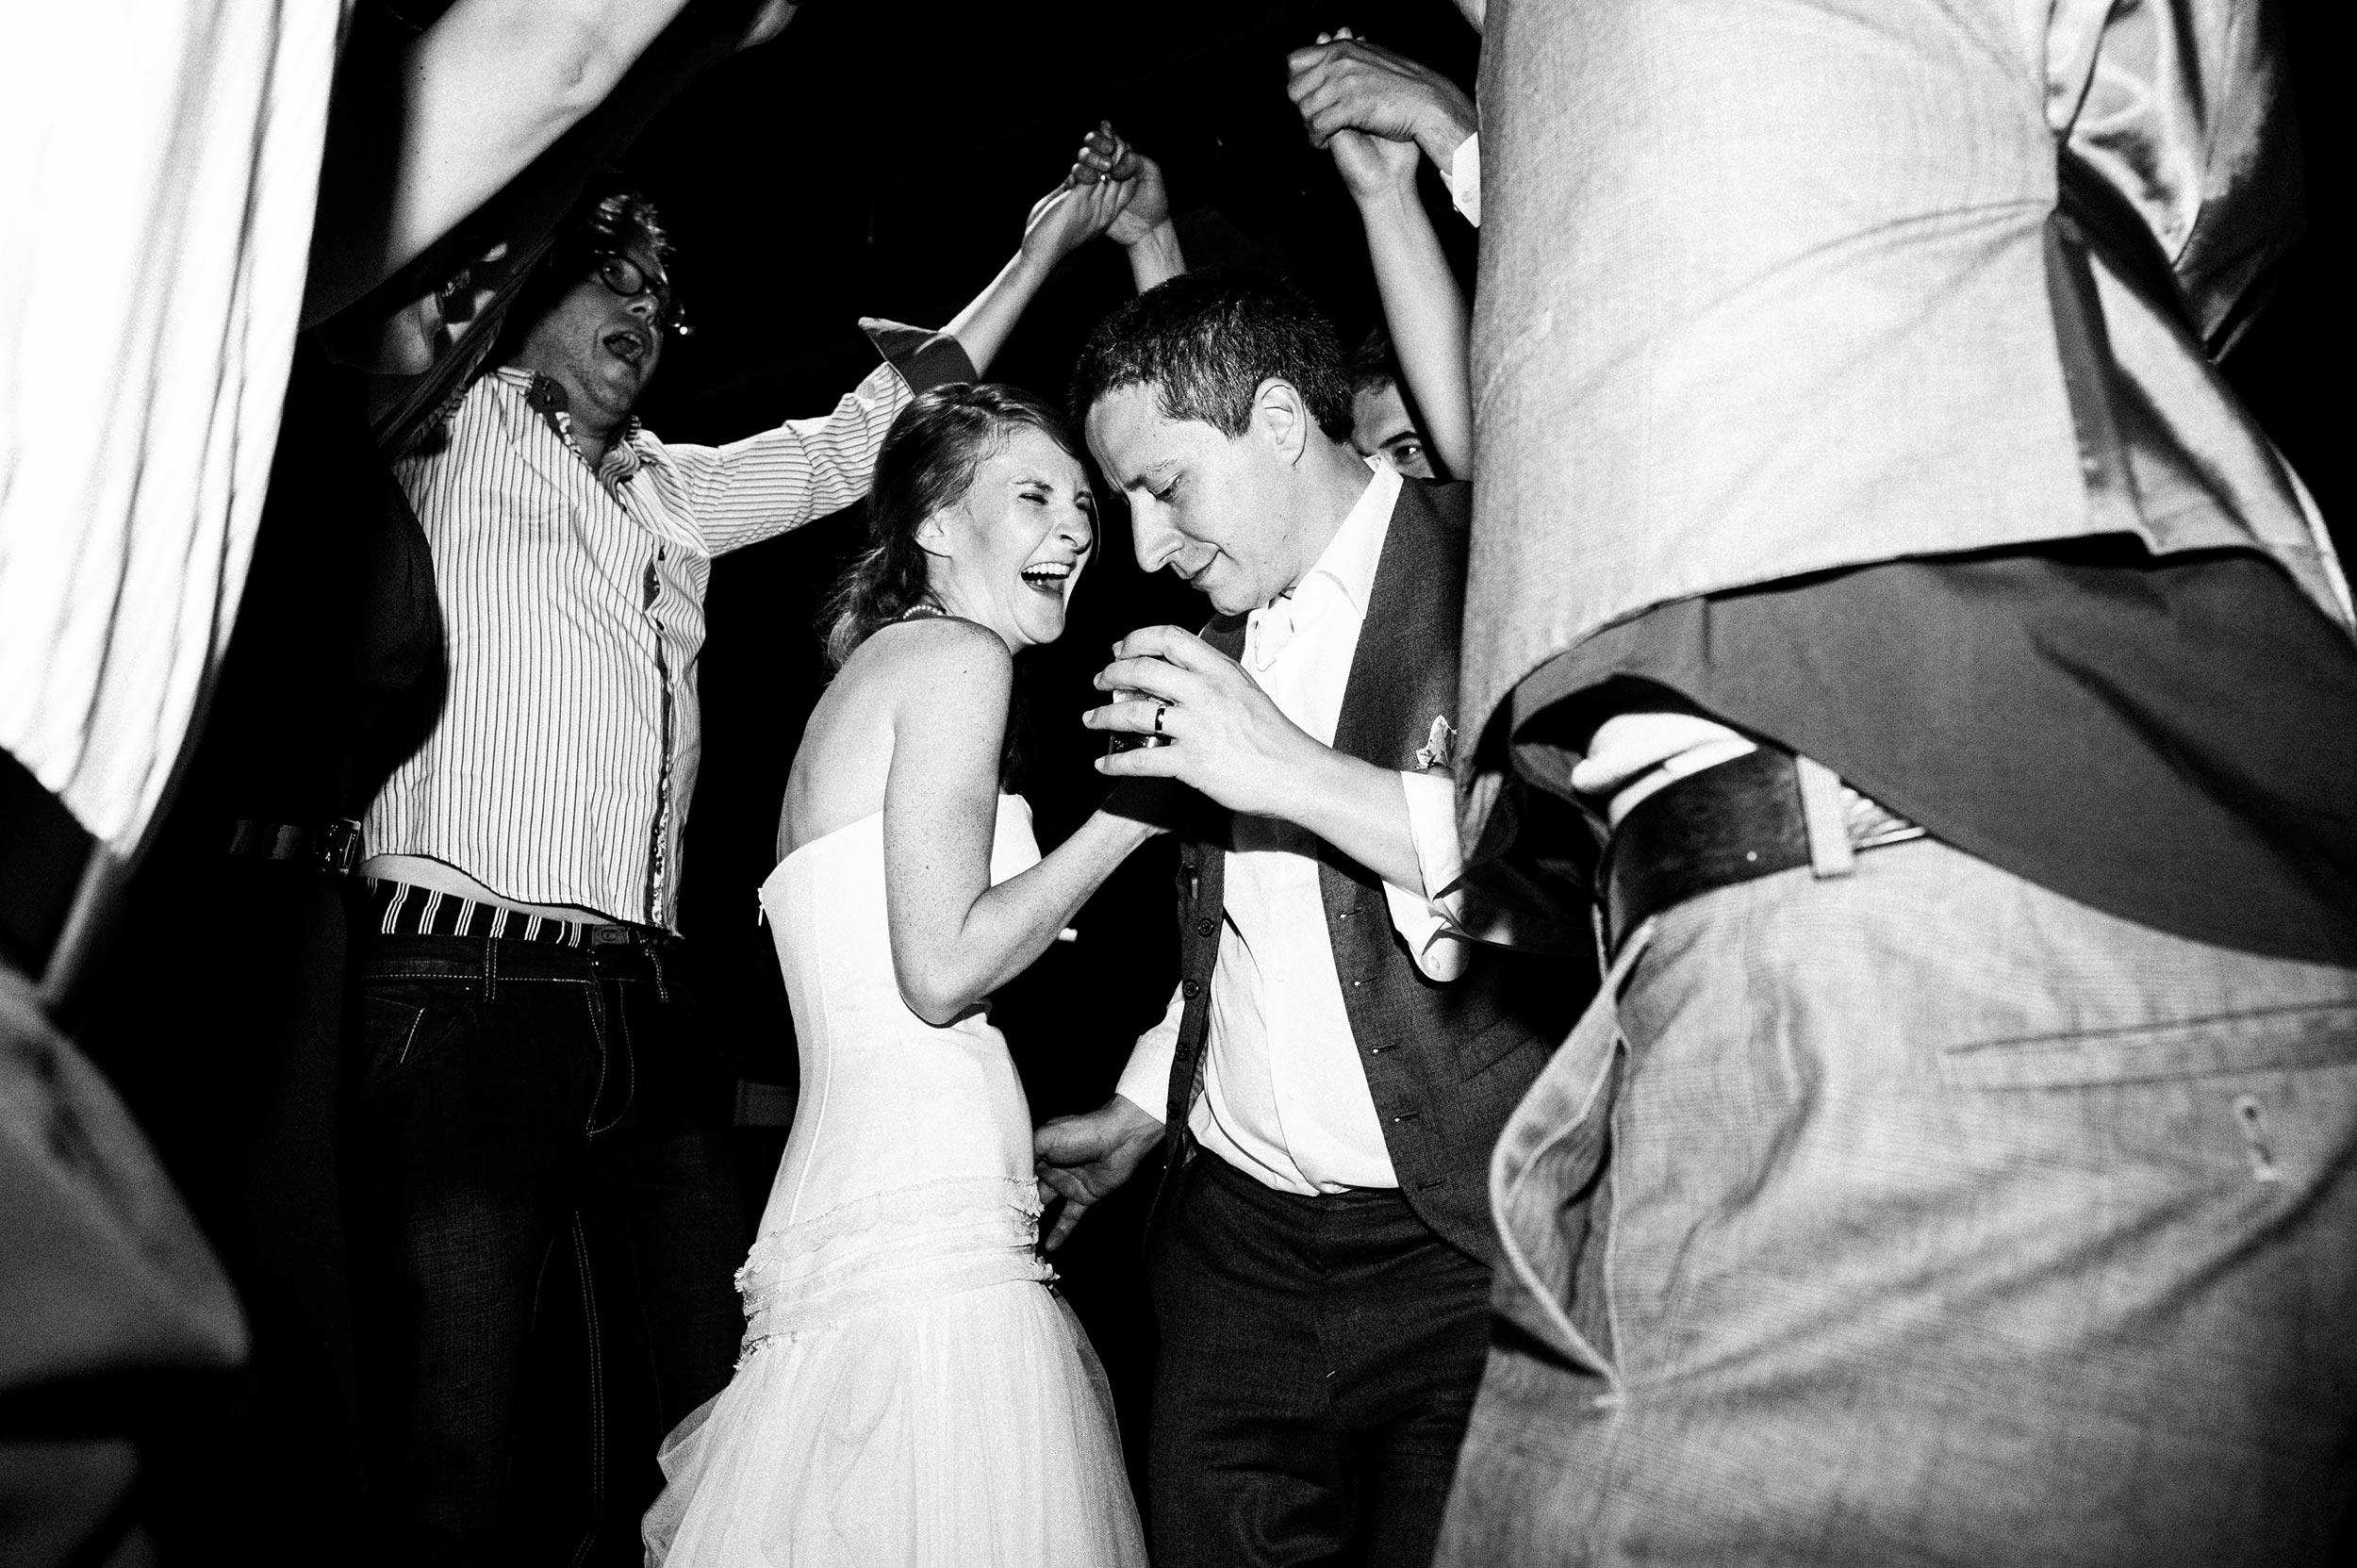 2014-Shelby-Jocelyn-Santo-Stefano-Di-Sessanio-Wedding-Photographer-Italy-Alessandro-Avenali-48.jpg